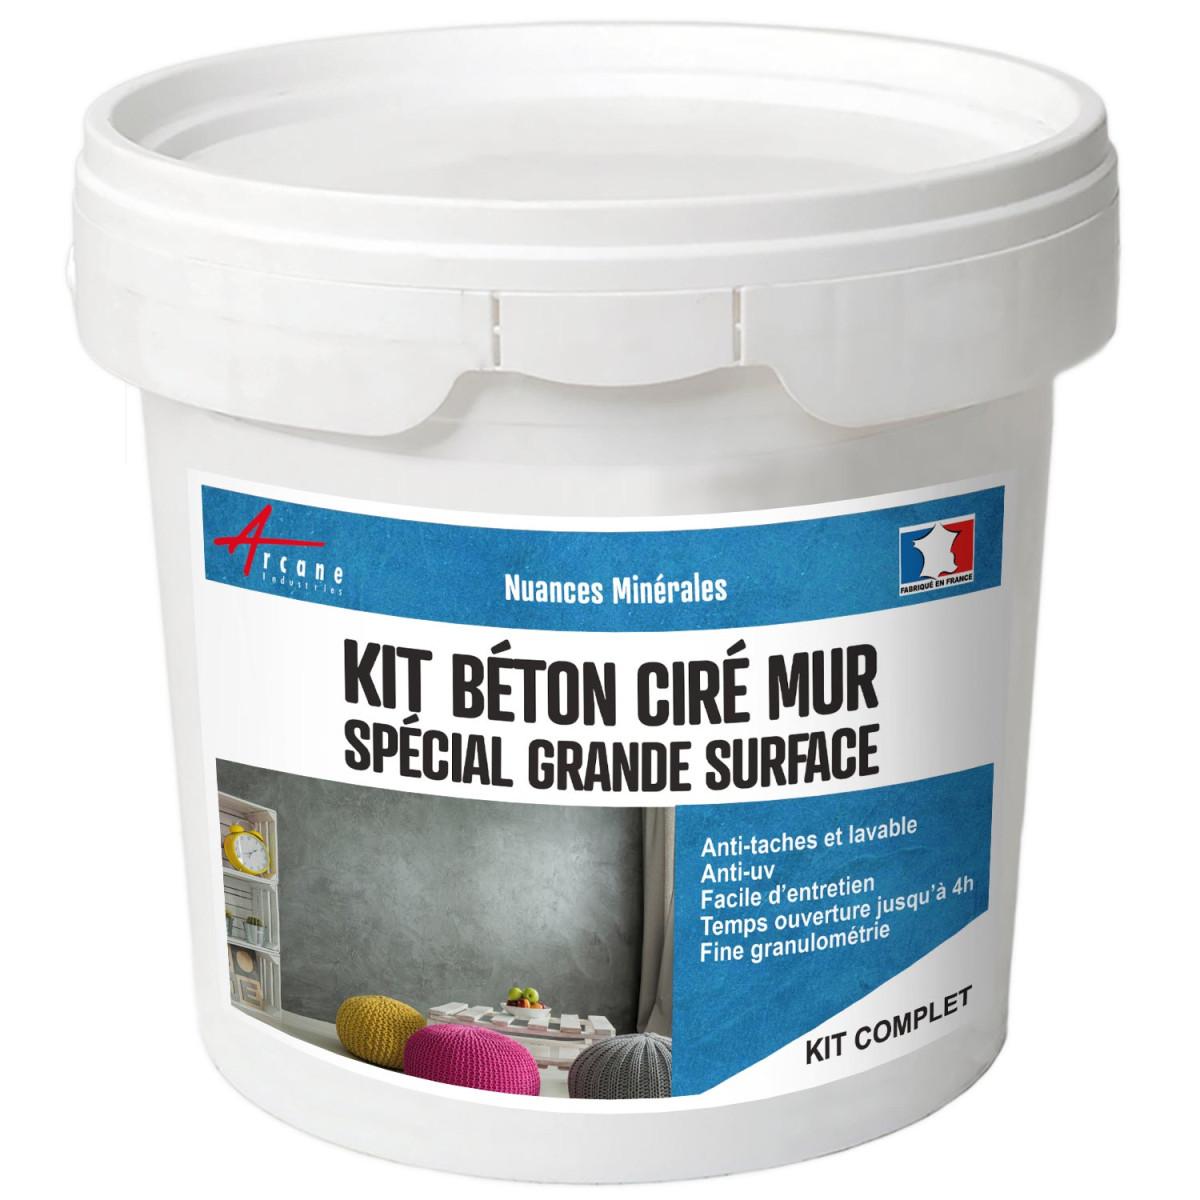 KIT BÉTON CIRÉ MURS GRANDE SURFACE - Béton ciré spécial murs